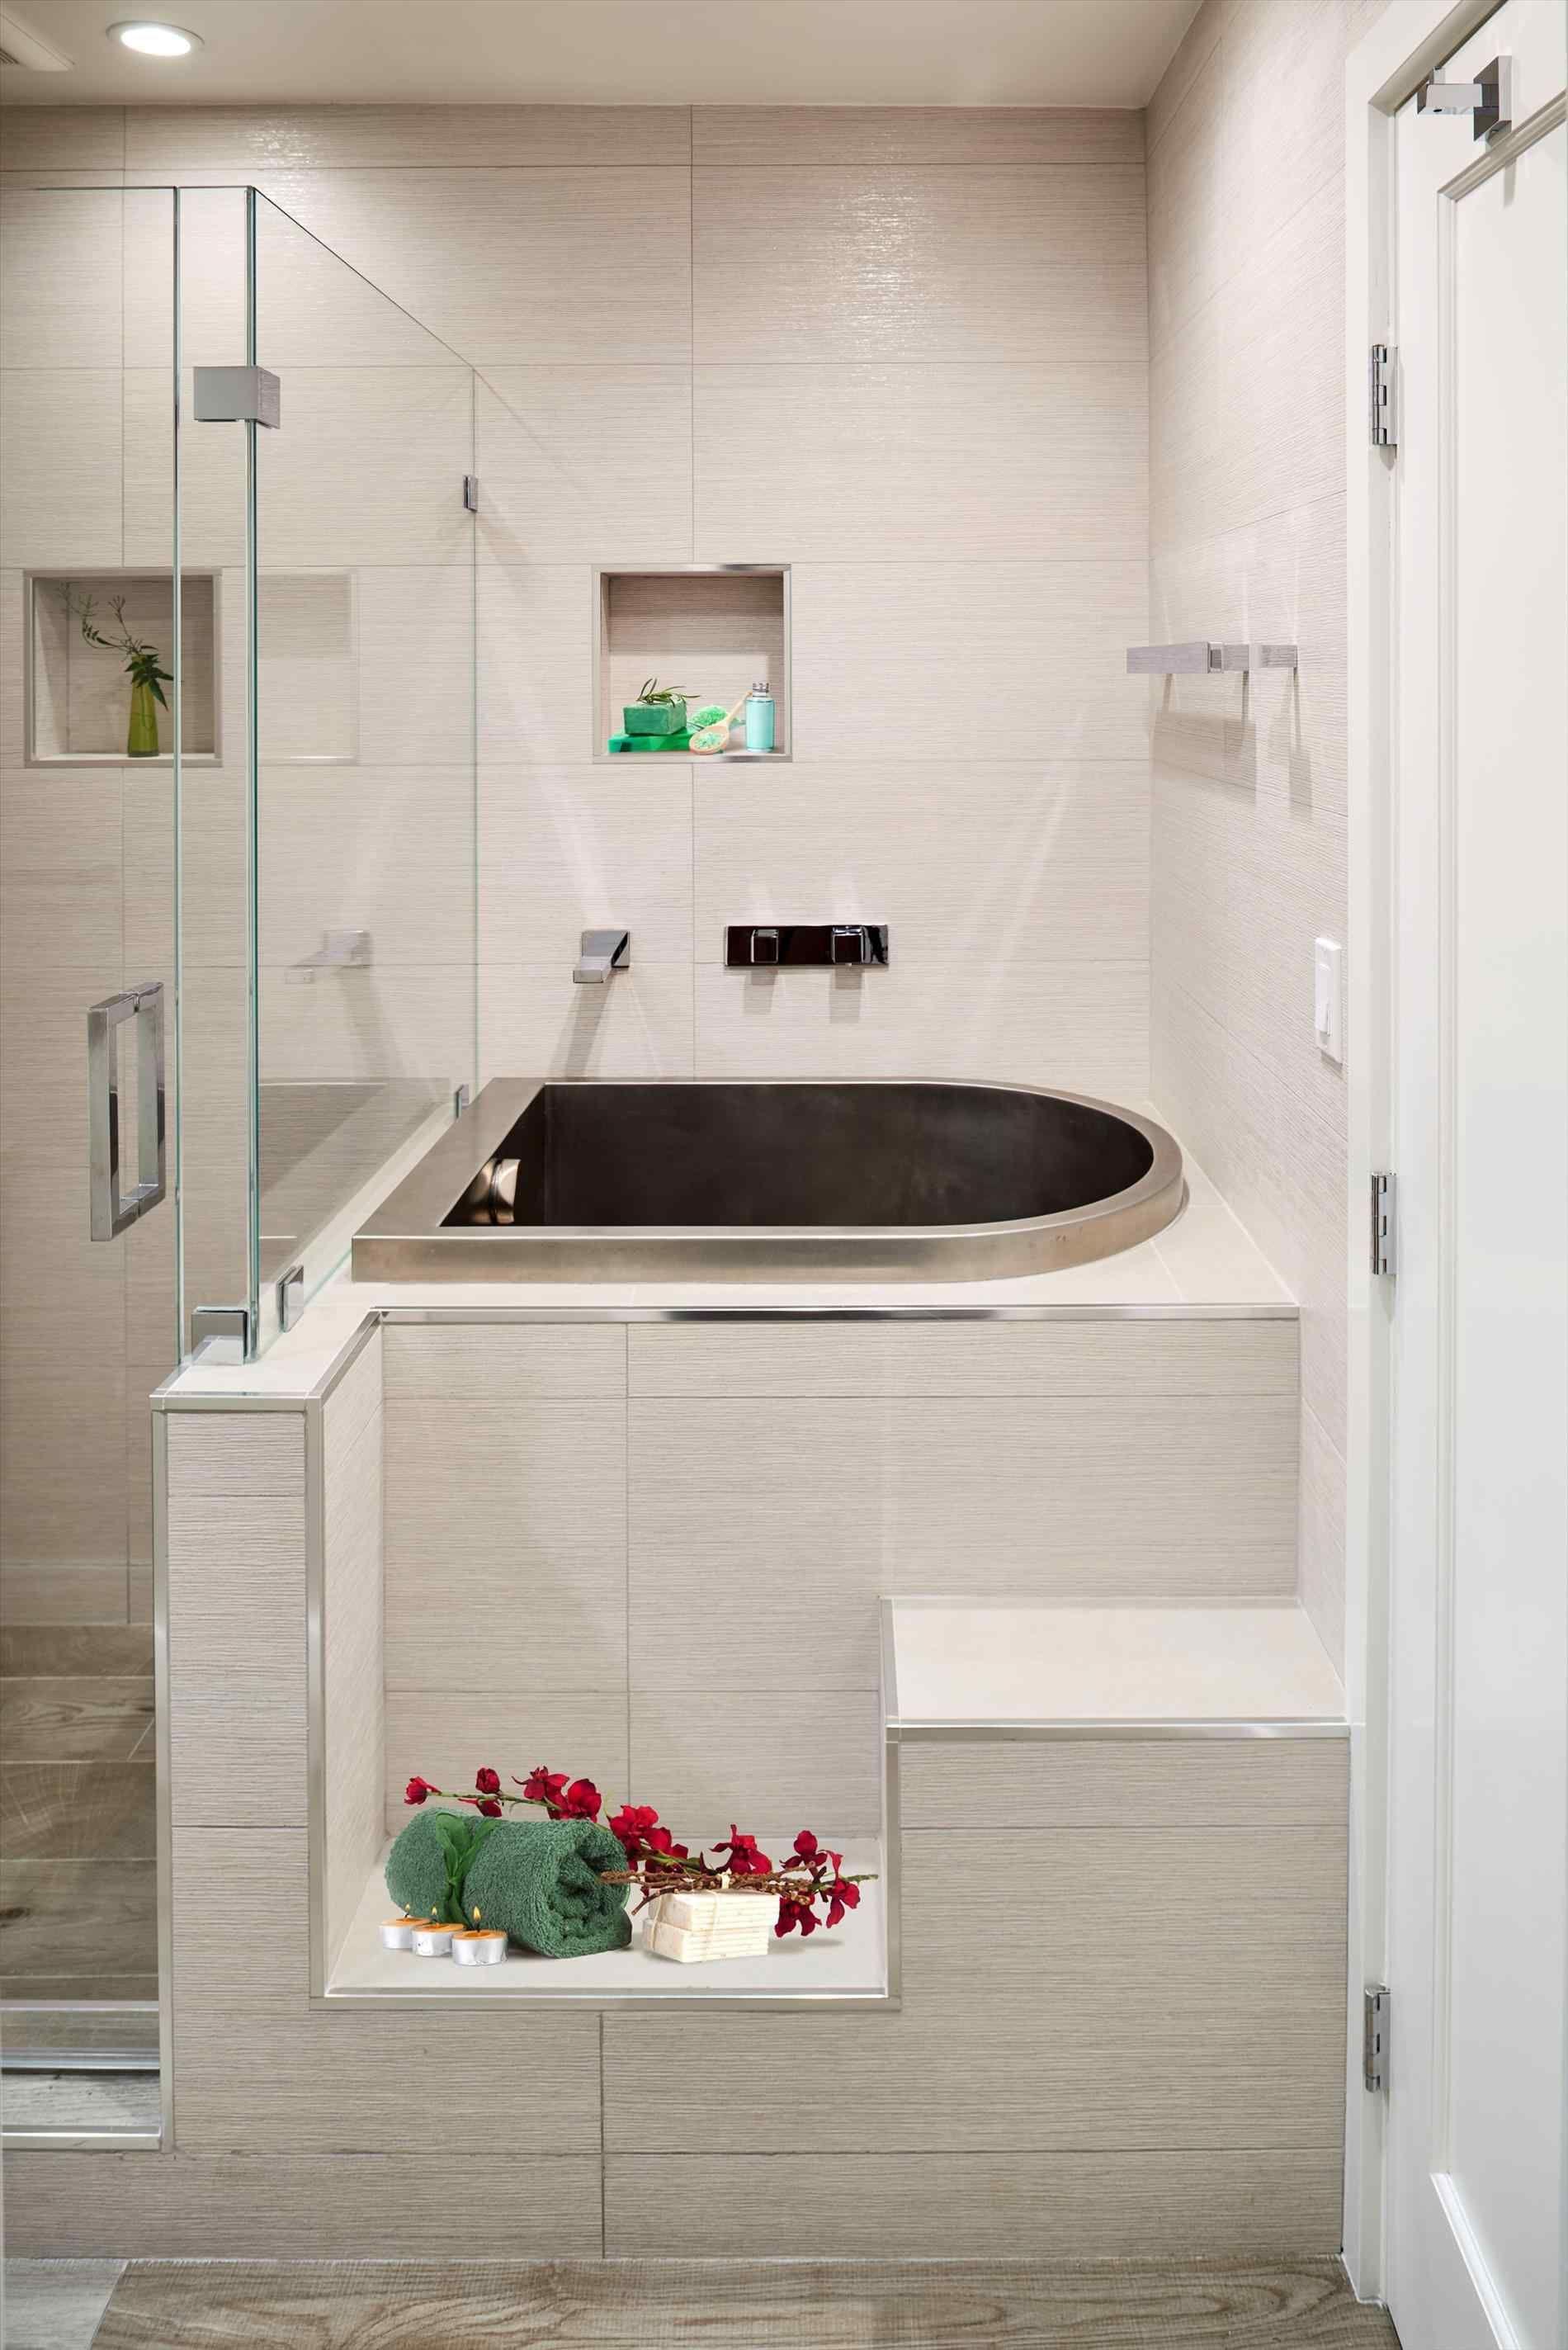 baths or showers